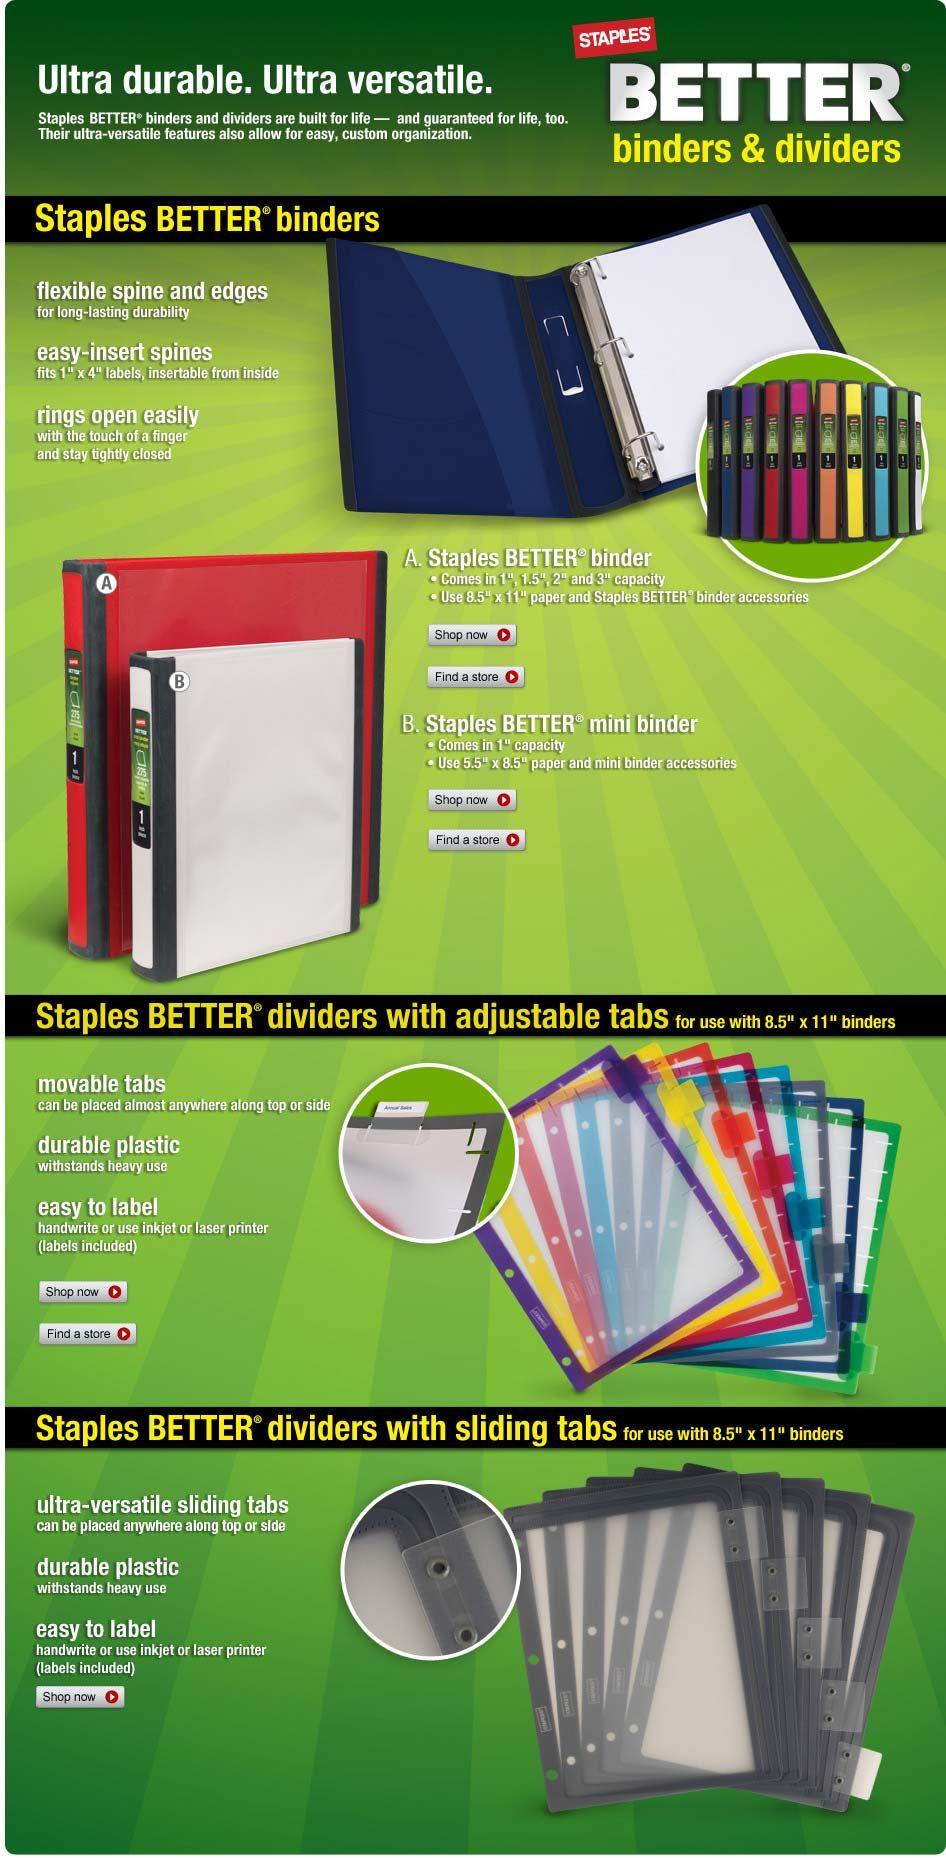 staples better binders and dividers binder dividers. Black Bedroom Furniture Sets. Home Design Ideas